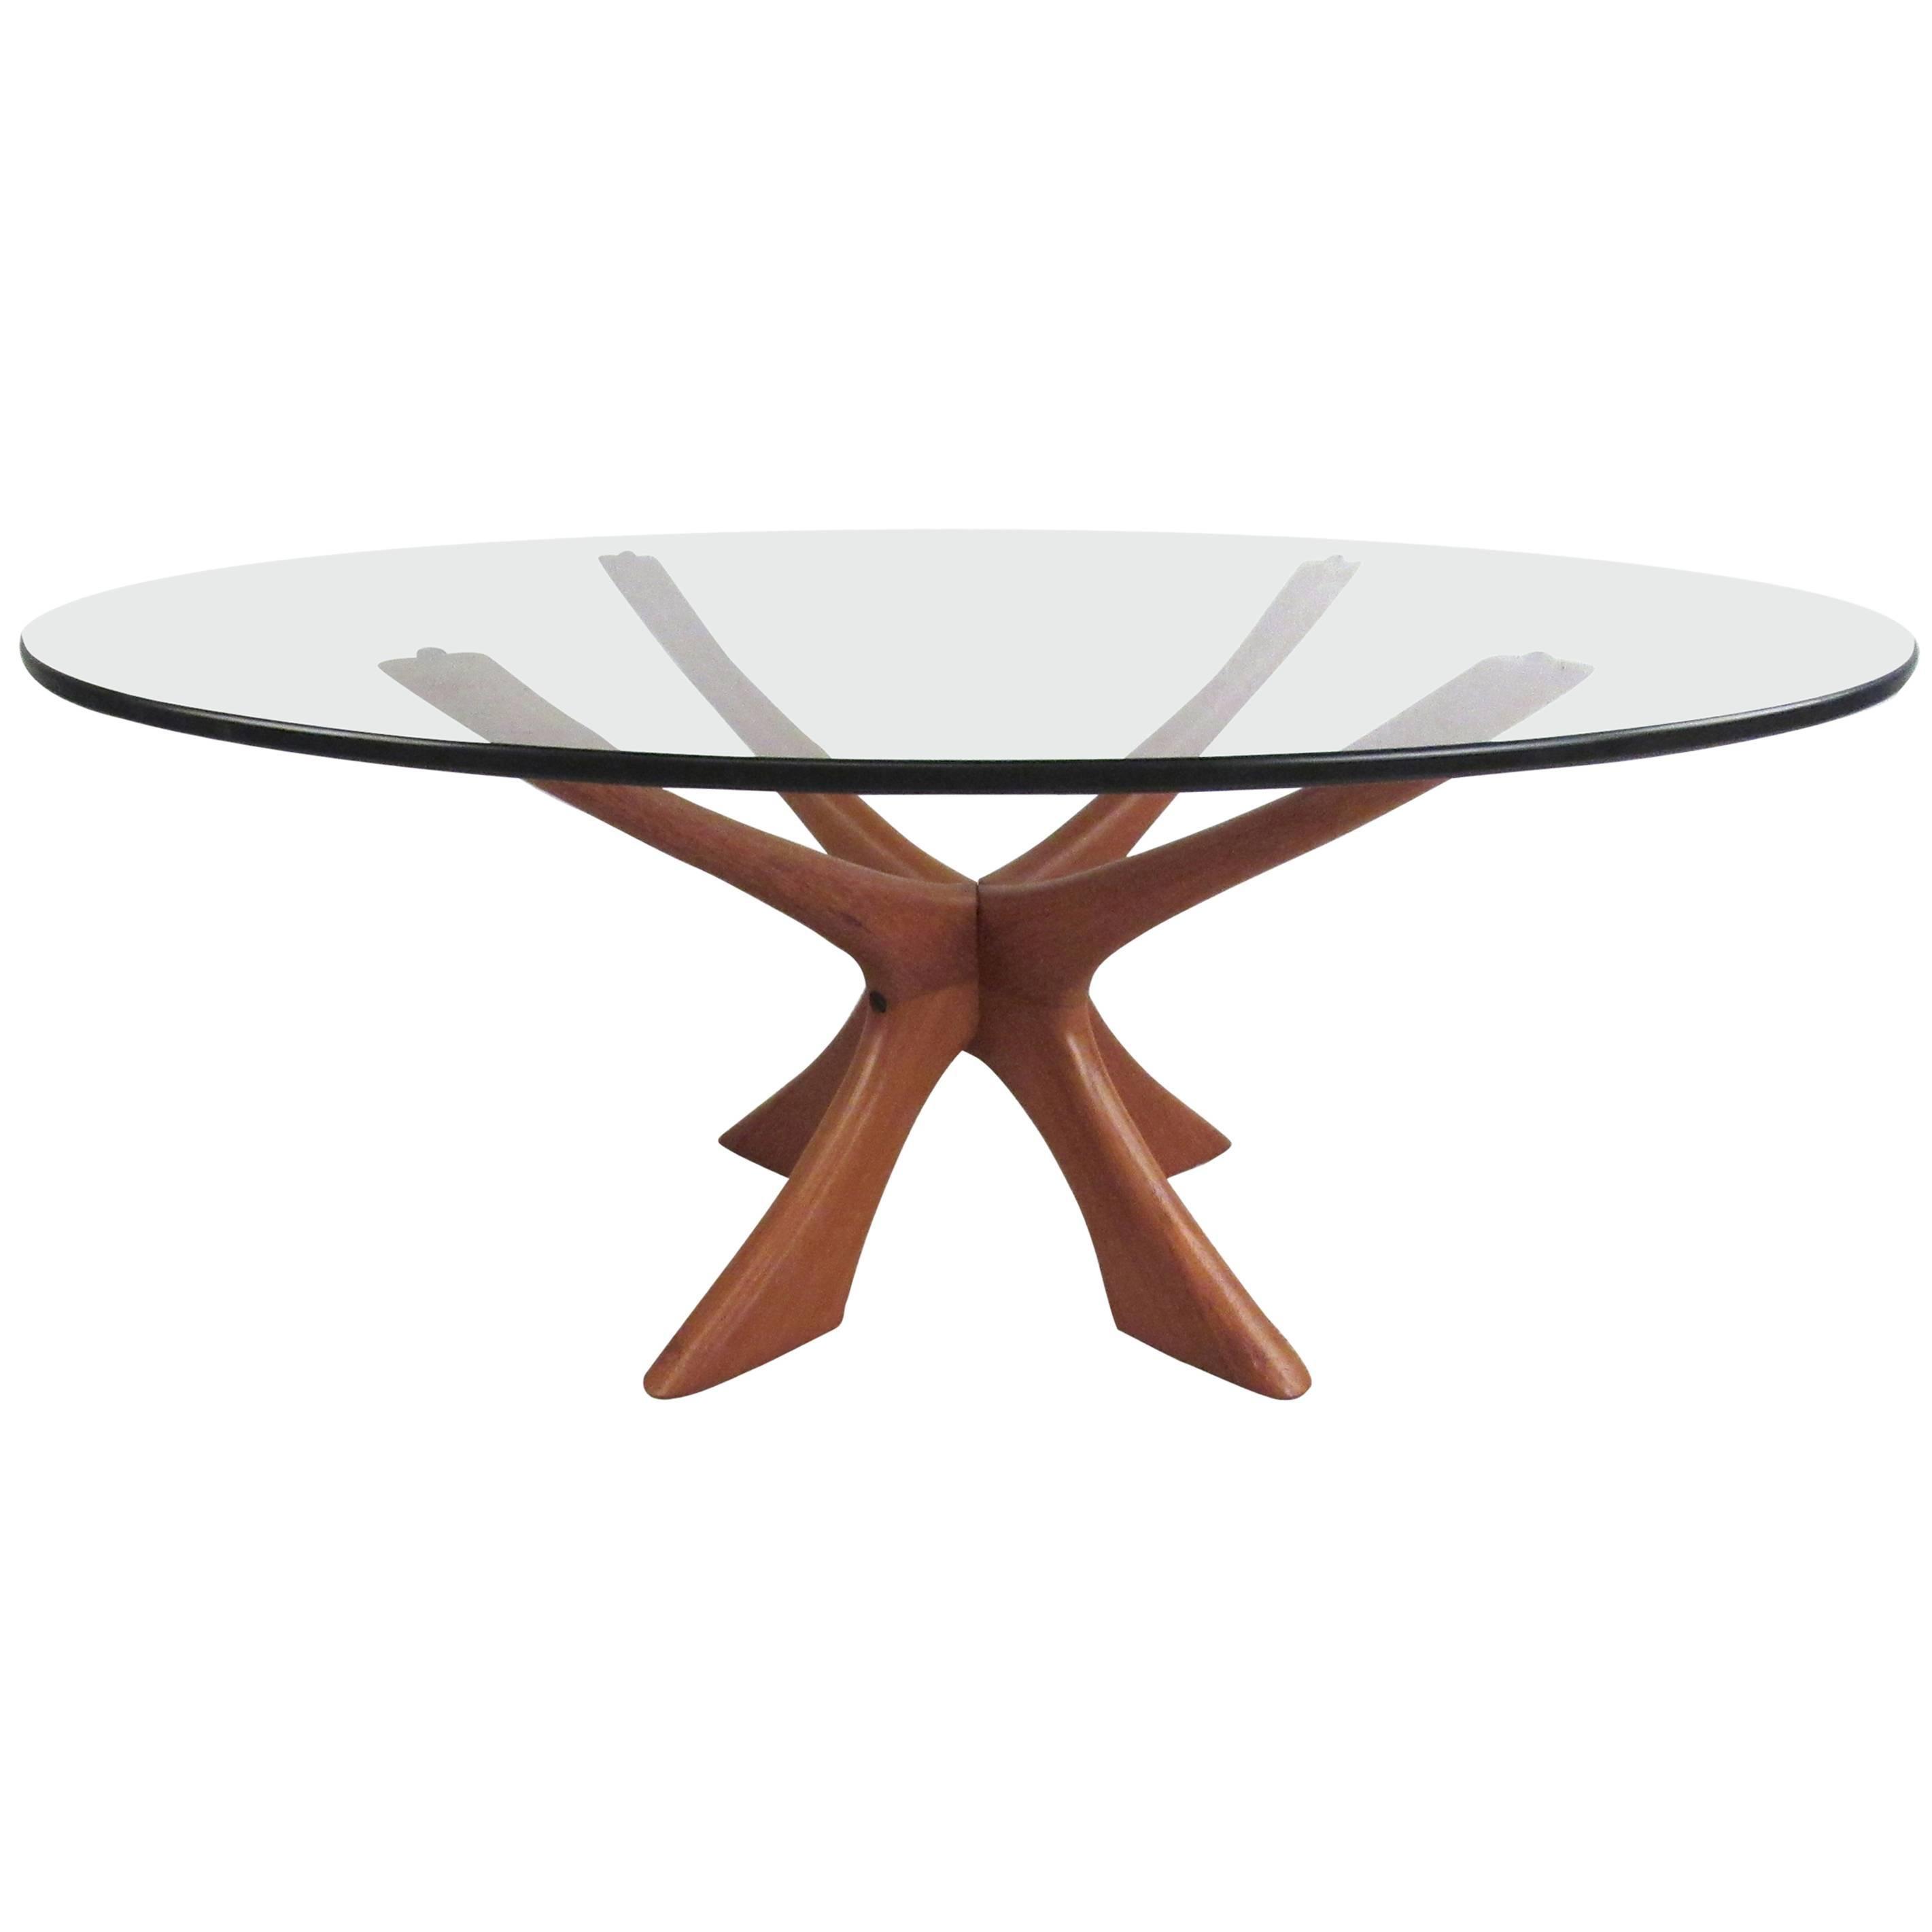 Illum Wikkelsø Scandinavian Modern Coffee Table